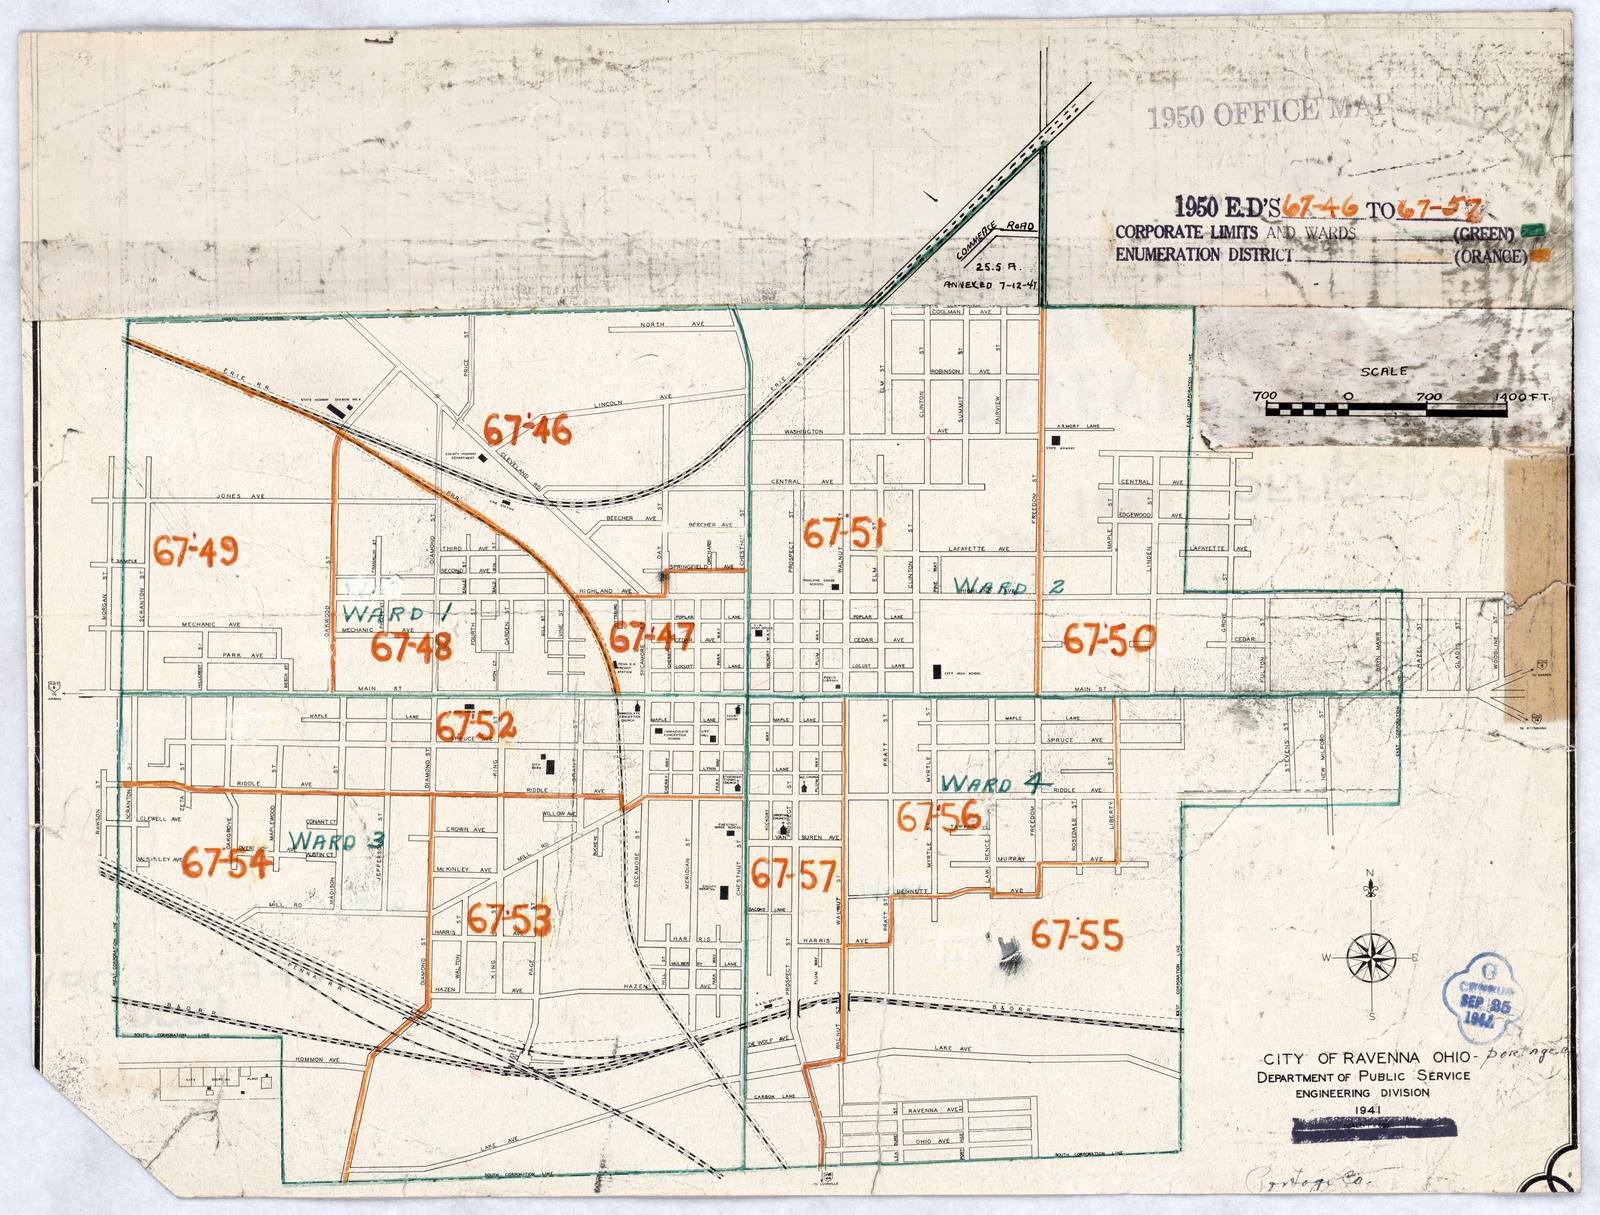 1950 Census Enumeration District Maps Ohio Oh Portage County